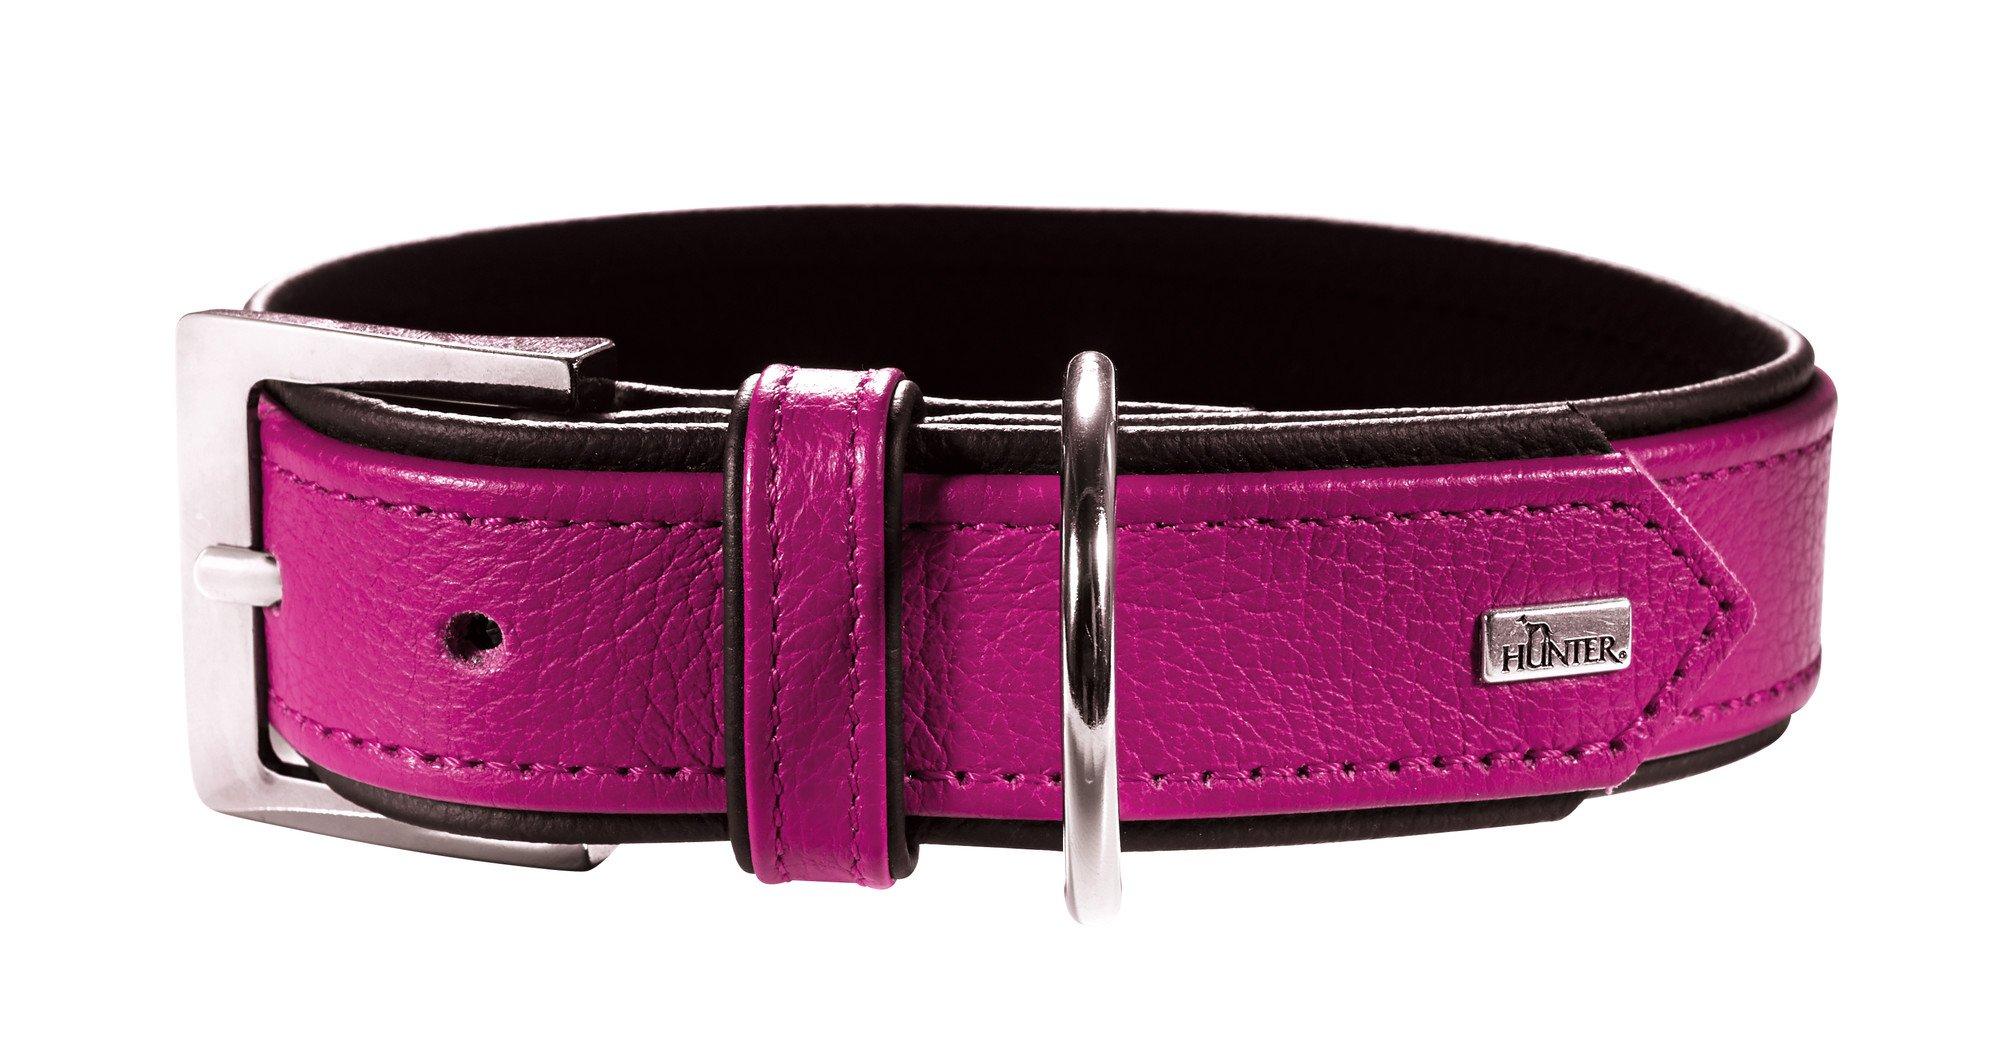 Hunter HT62454 Capri Nappa Leather Collar, One Size by Hunter